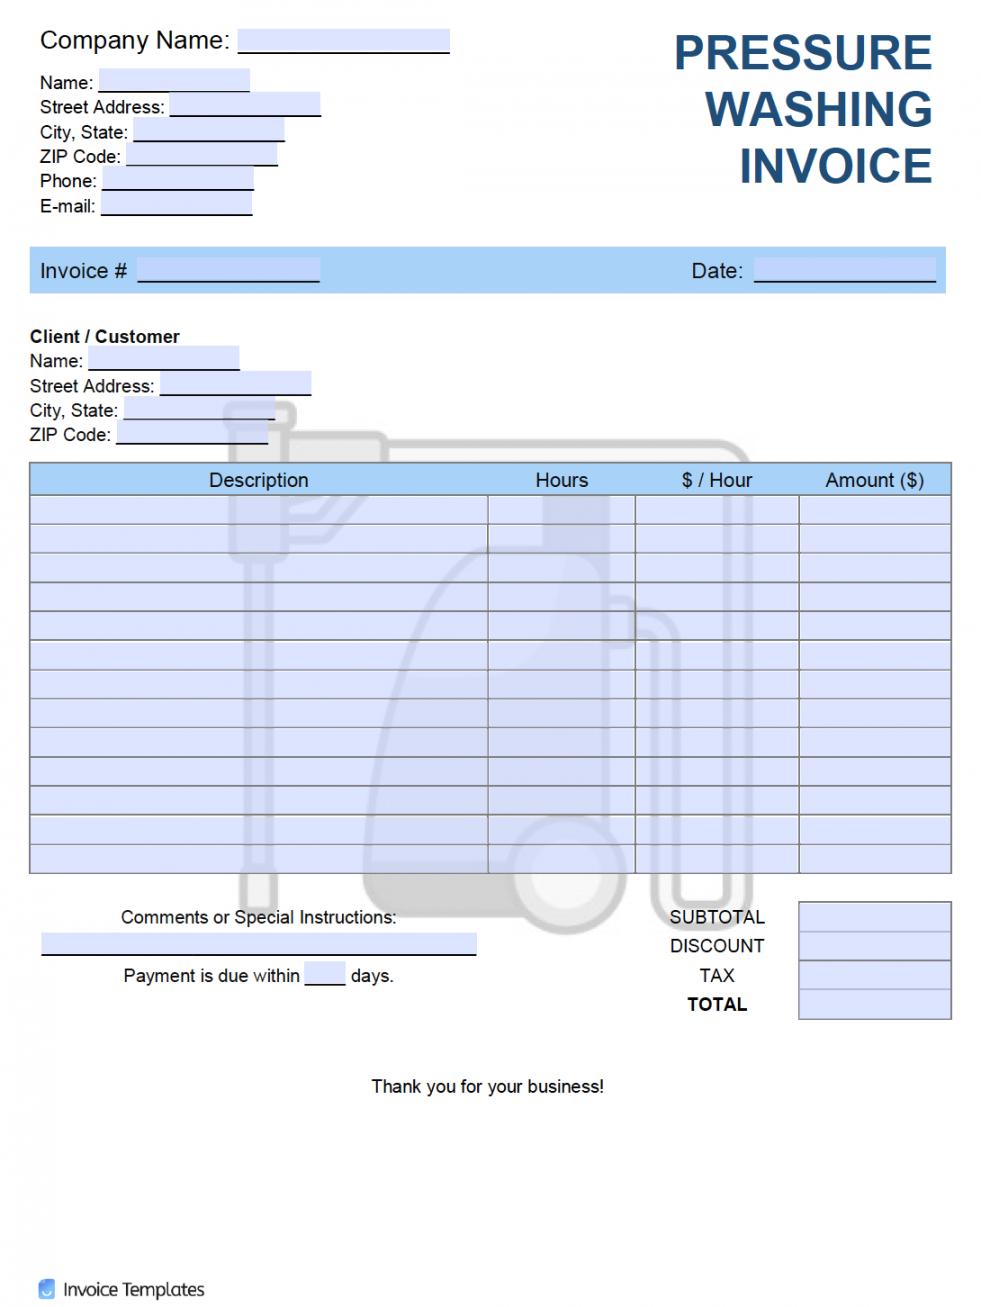 editable free pressure washing invoice template  pdf  word  excel pressure washing estimate template excel